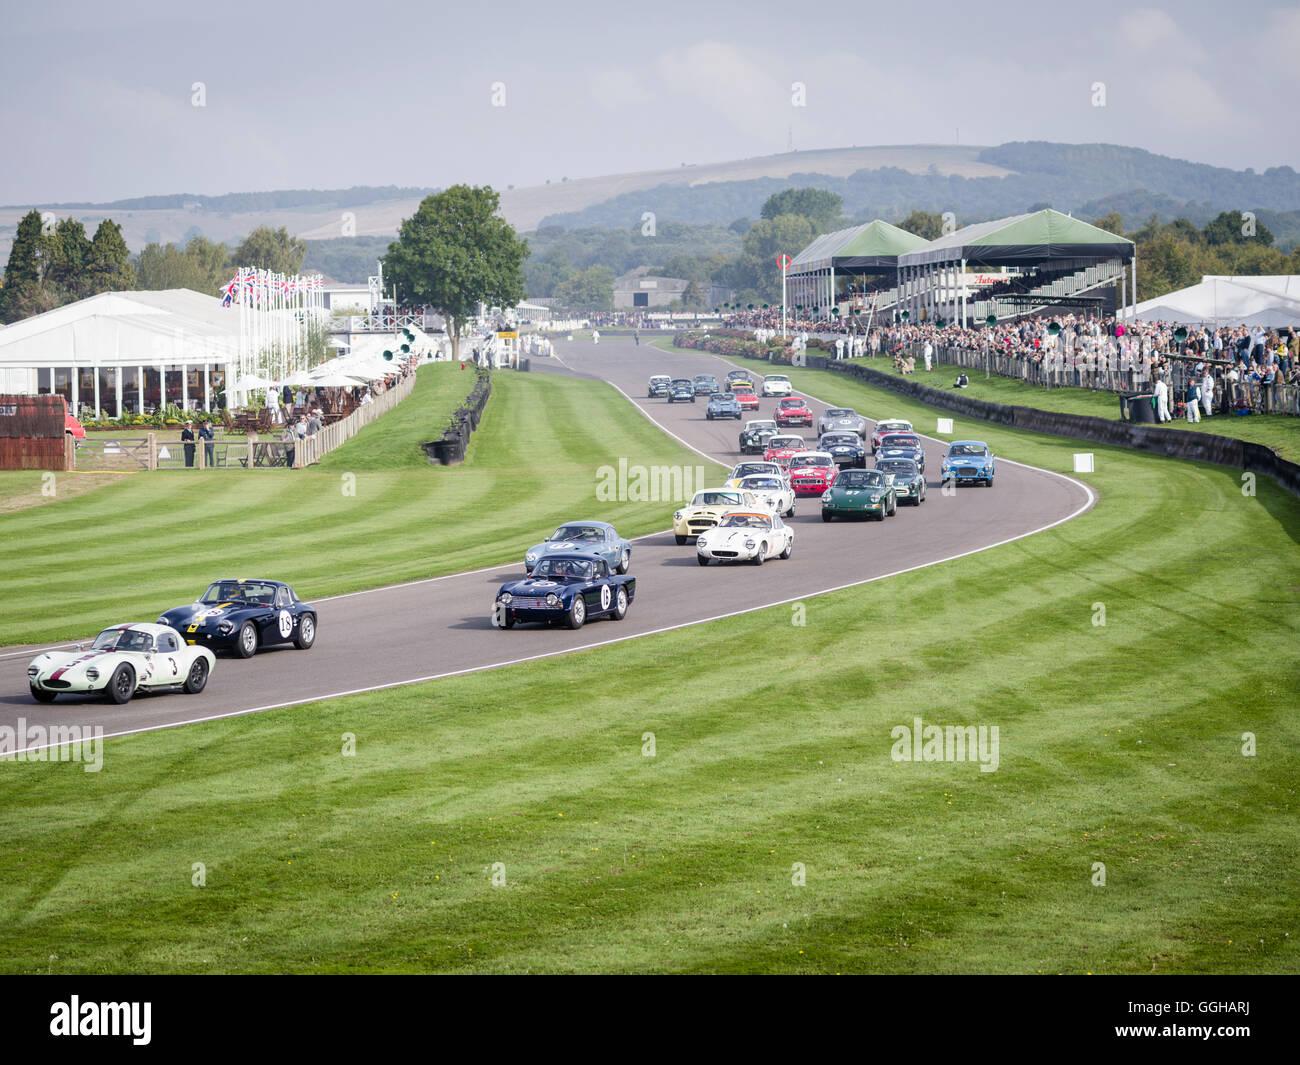 Fordwater Trophy, beim Goodwood Revival 2014, Rennsport, Oldtimer, Goodwood, Chichester, Sussex, England, Großbritannien Stockfoto